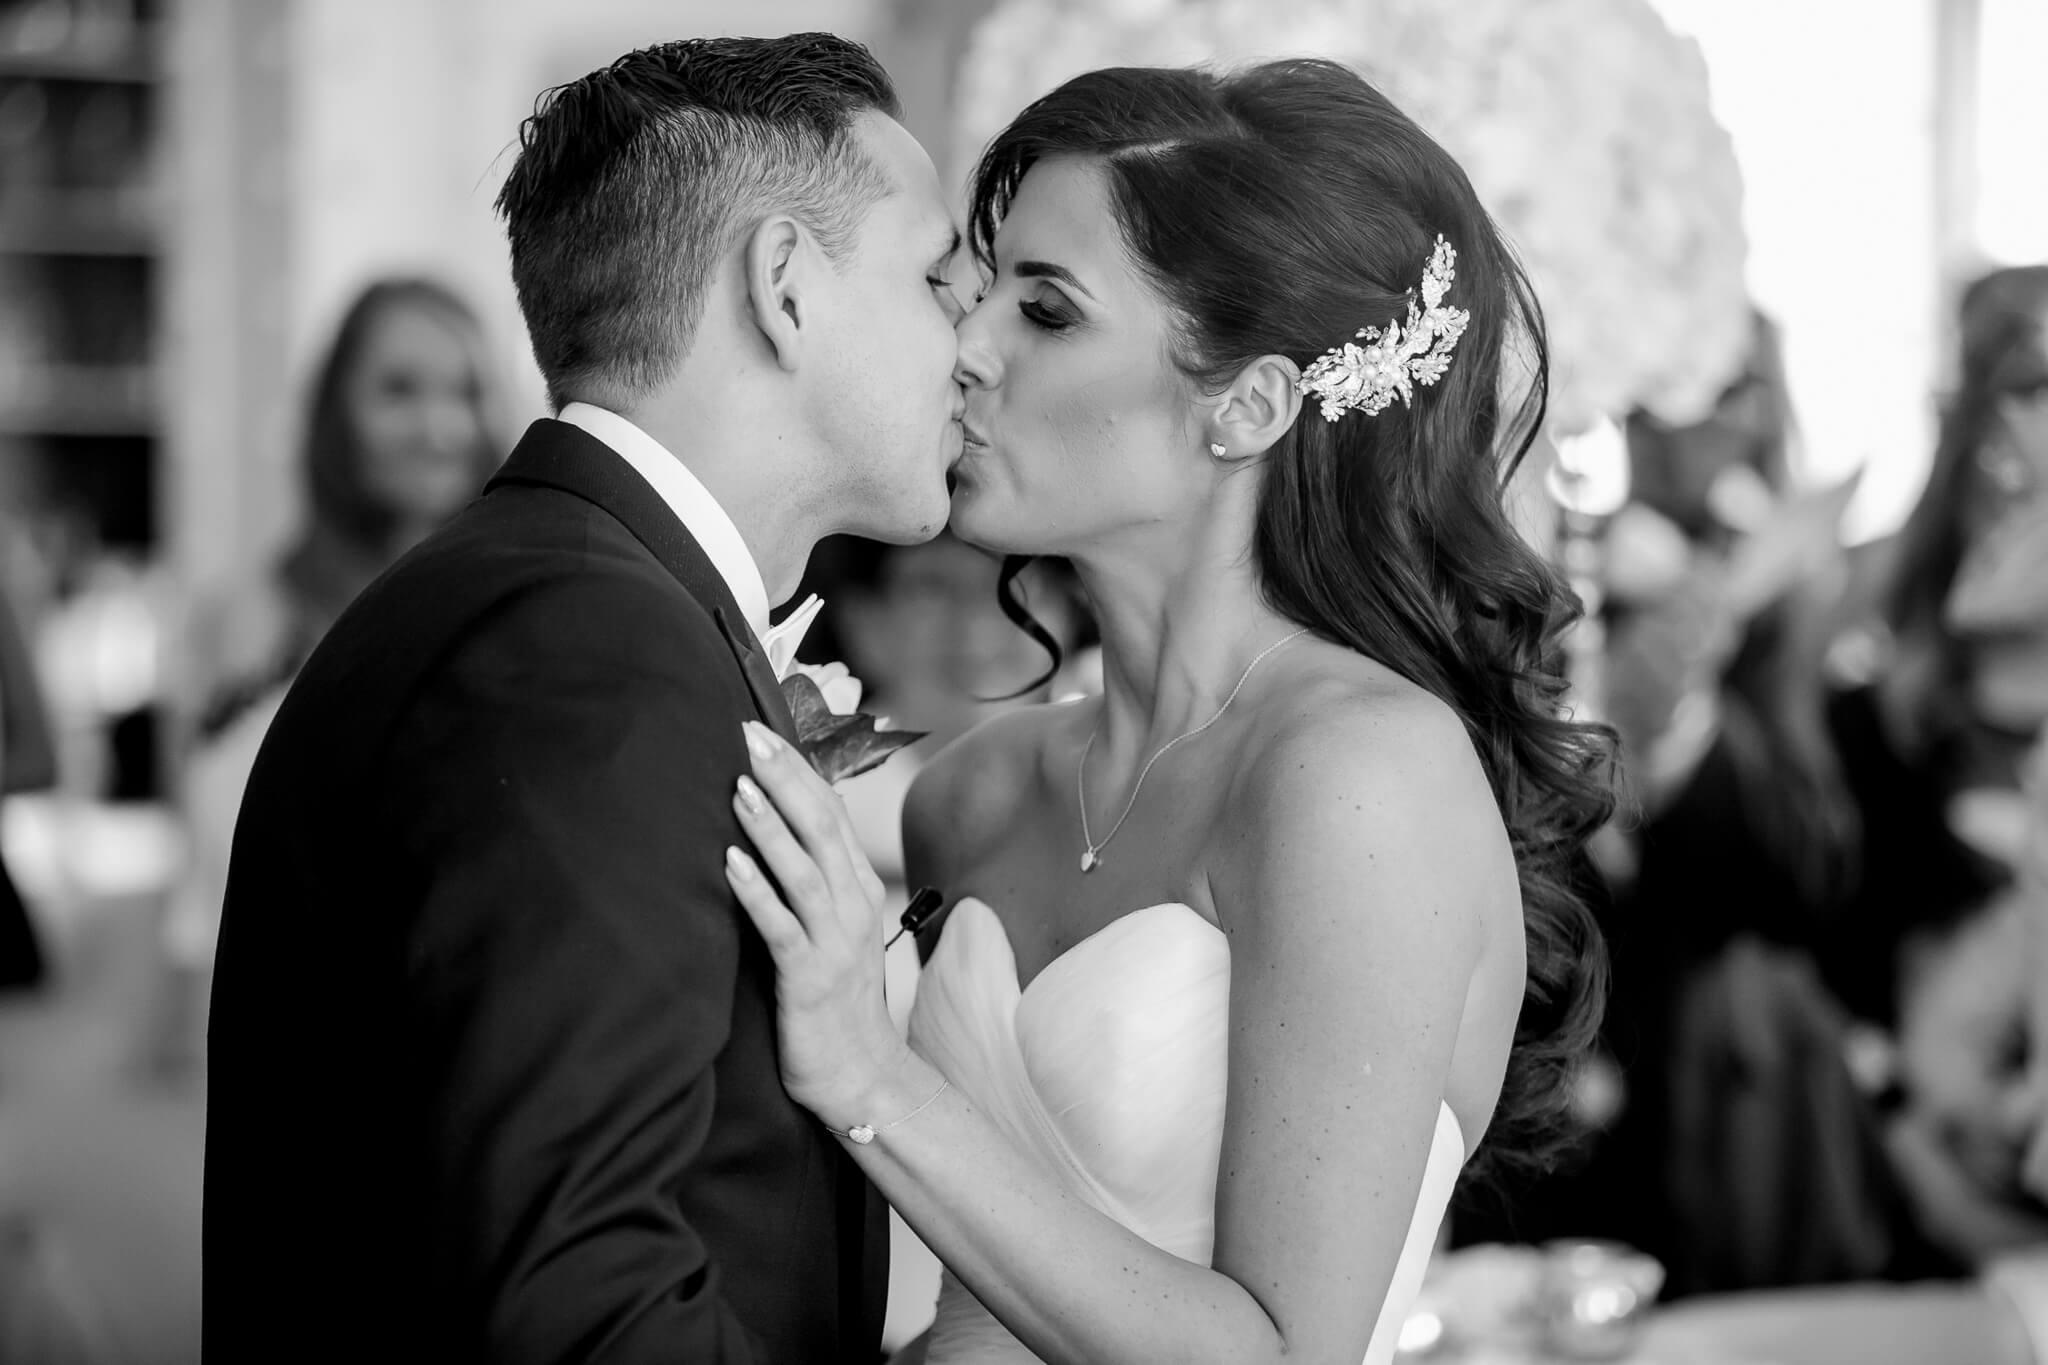 ceremony-bride-groom-kiss-liverpool30-james-street-wedding